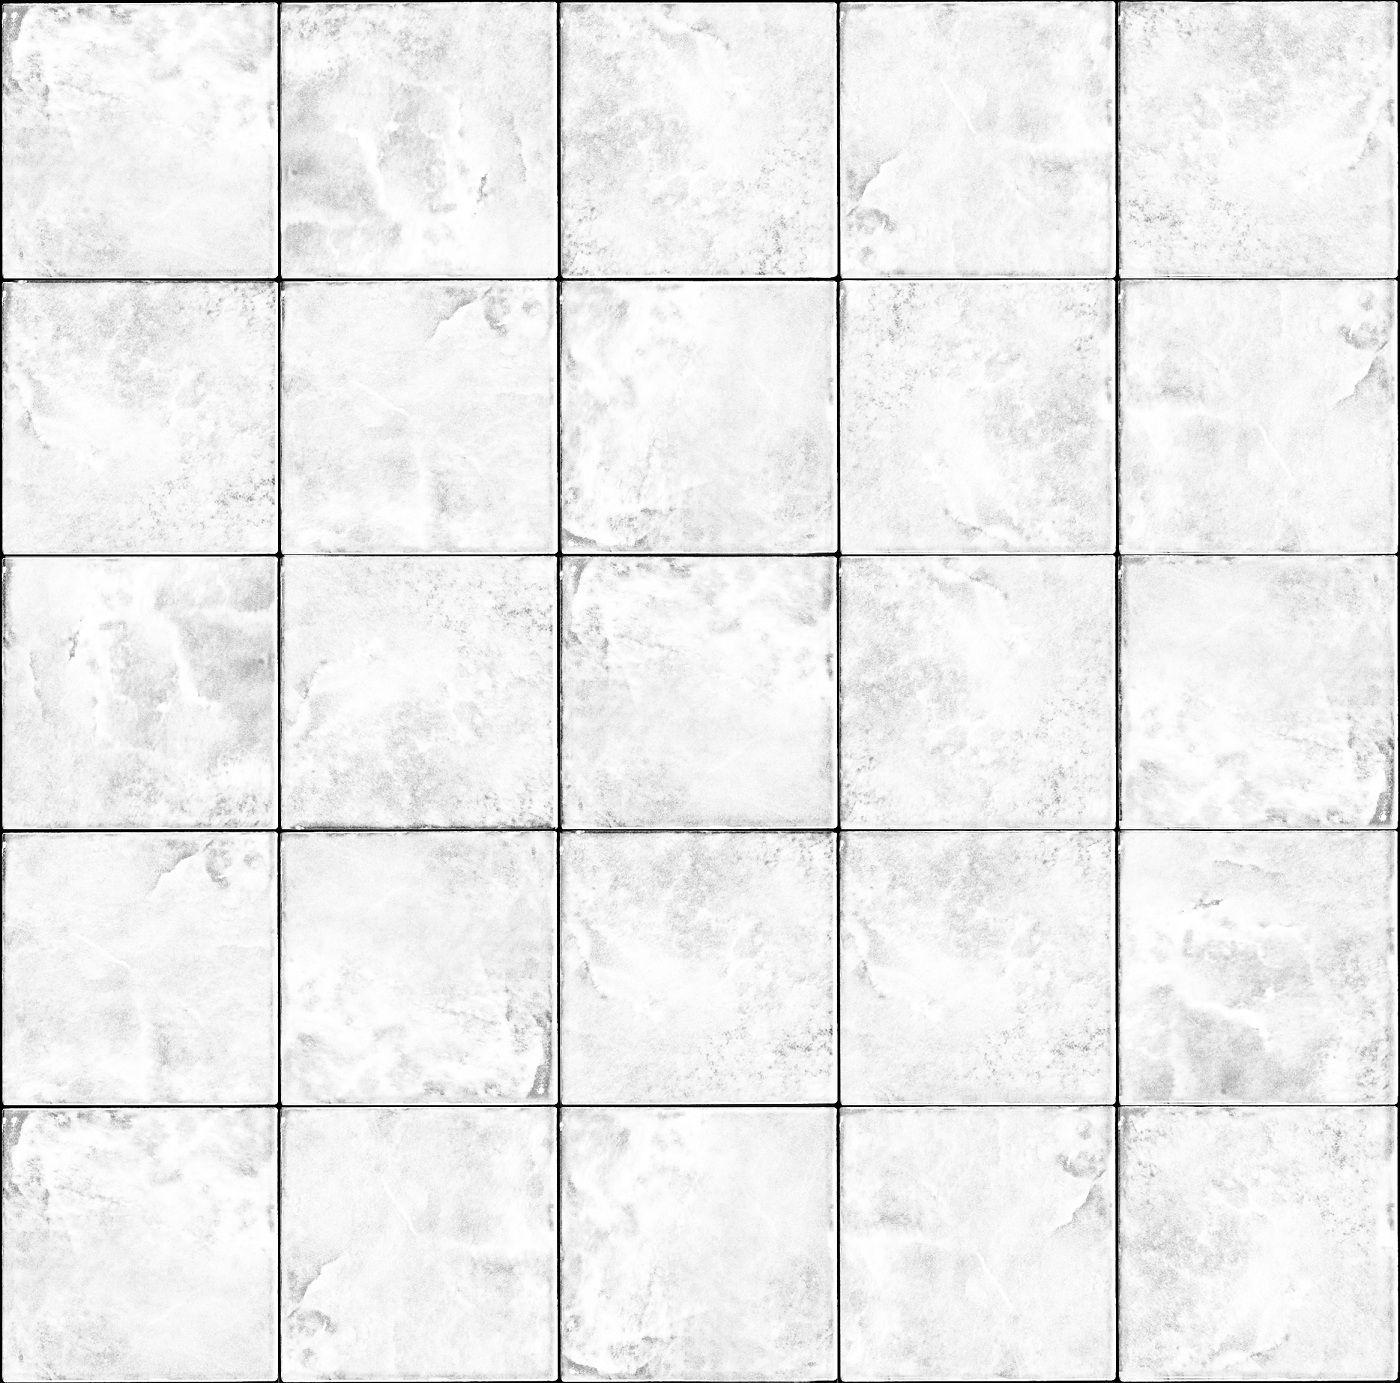 Texture tile white pesquisa google textures pinterest explore grey floor tiles bathroom and more texture tile white dailygadgetfo Gallery